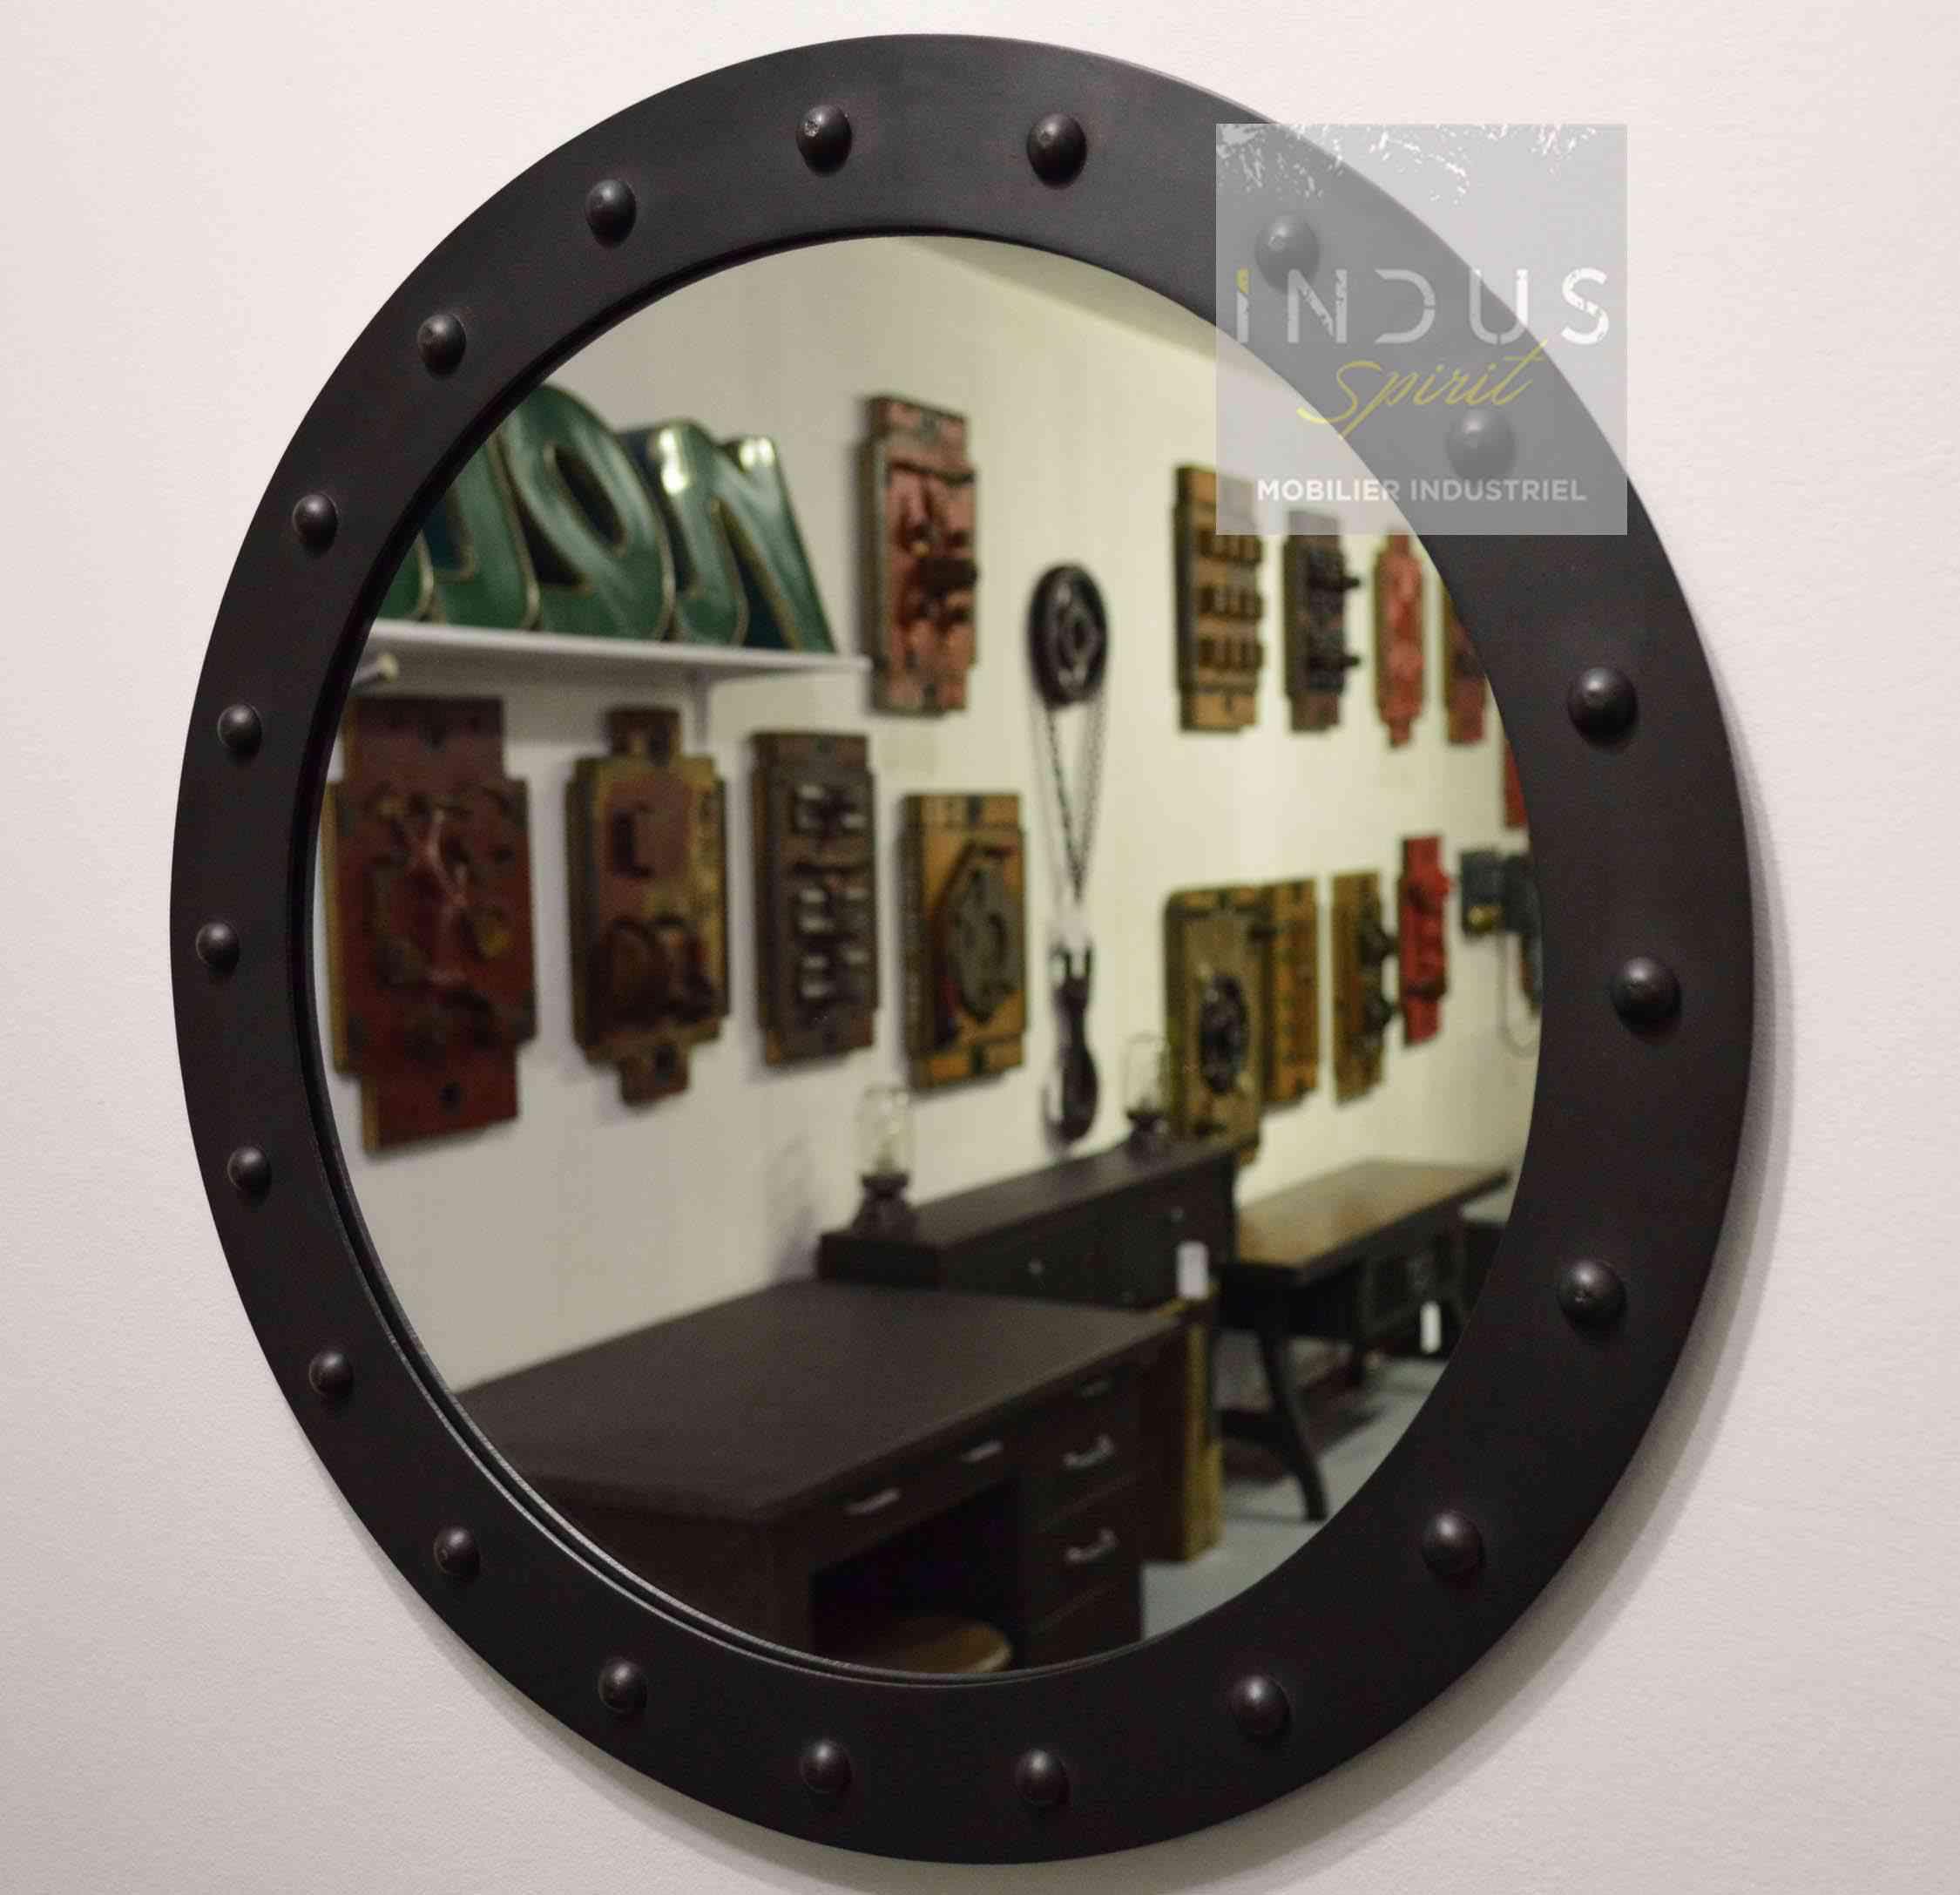 miroir-rond-industriel-sur-mesure.jpg